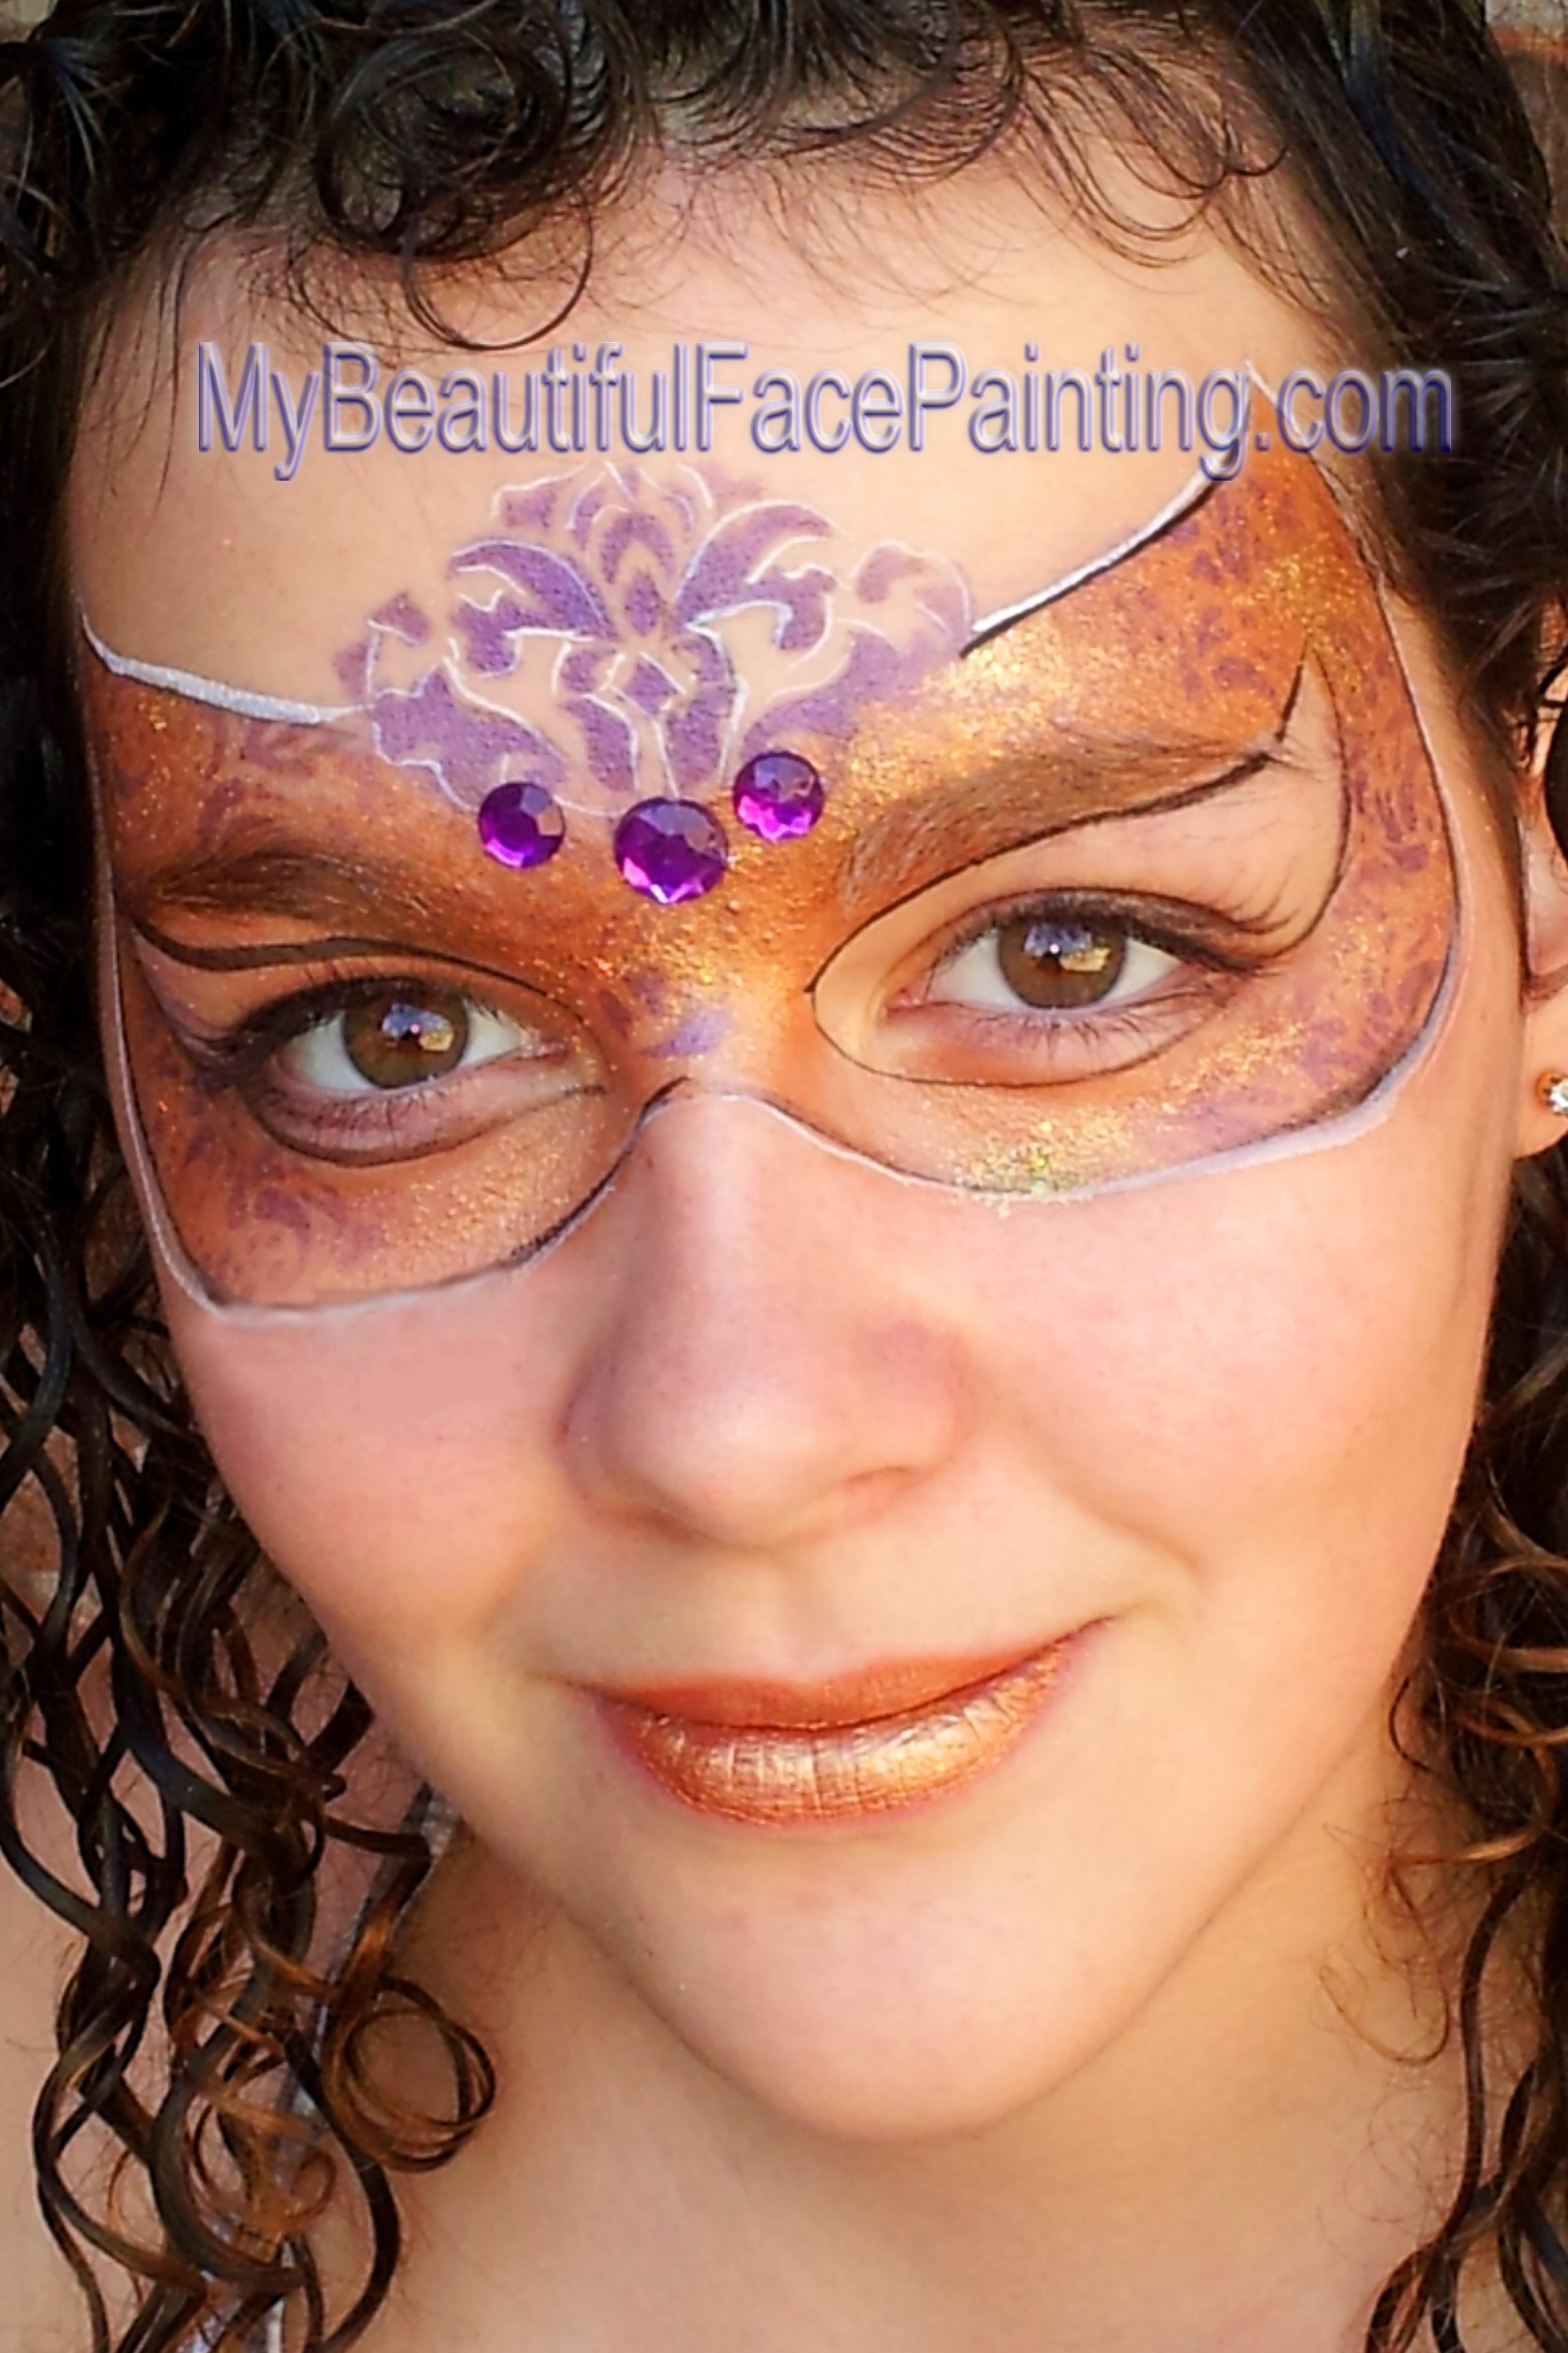 10 Wonderful Mardi Gras Face Painting Ideas mardi gras face painting mask in gold and purple face and body 2020